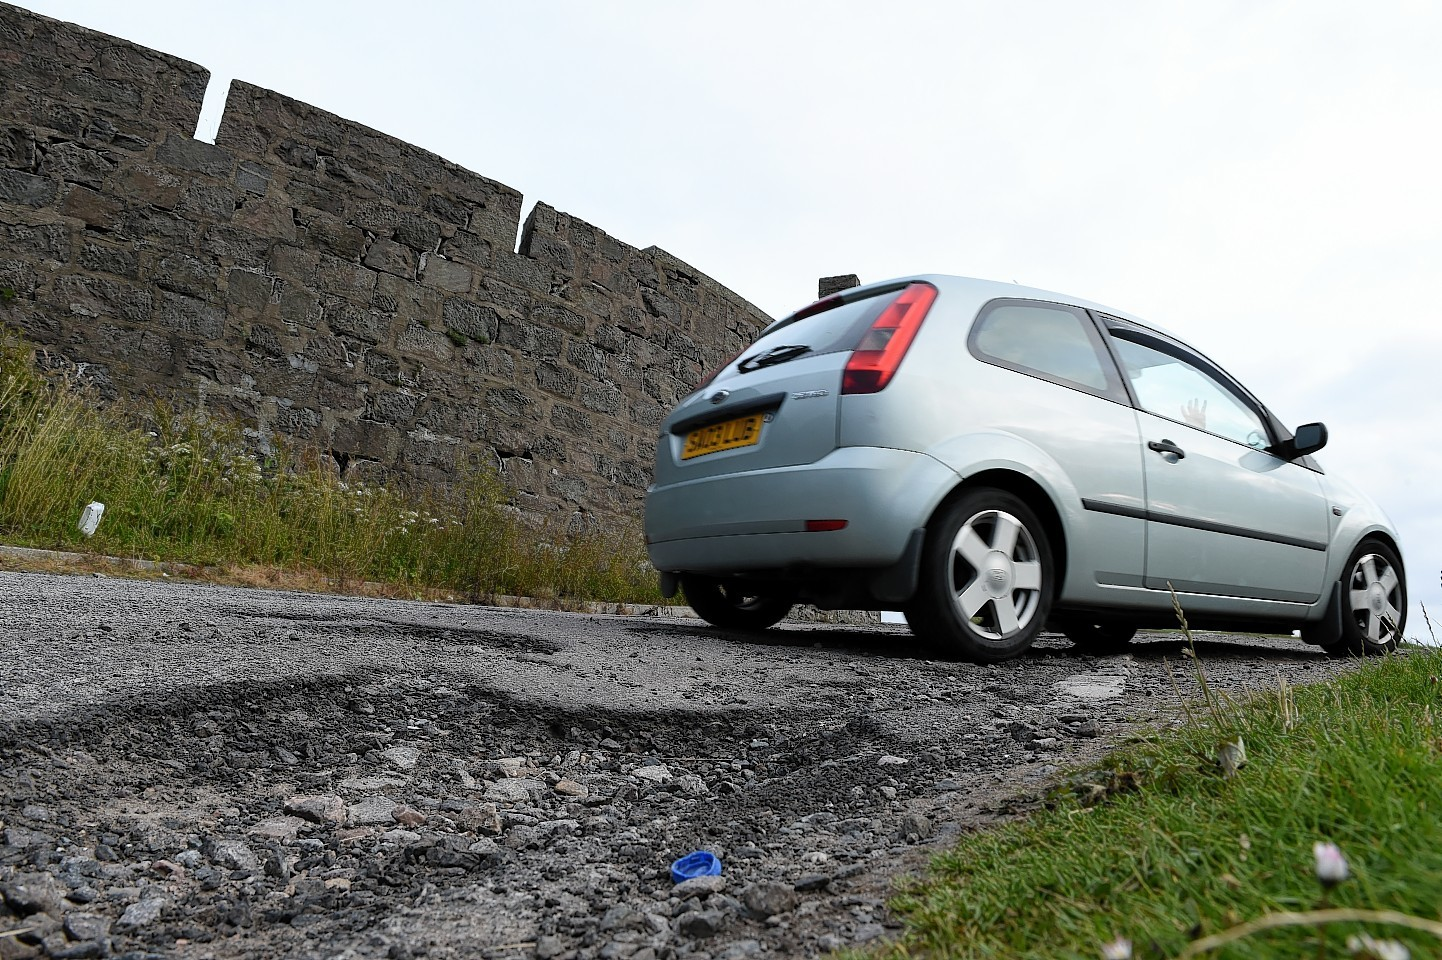 Potholes at Nigg car park. Picture by Kevin Emslie